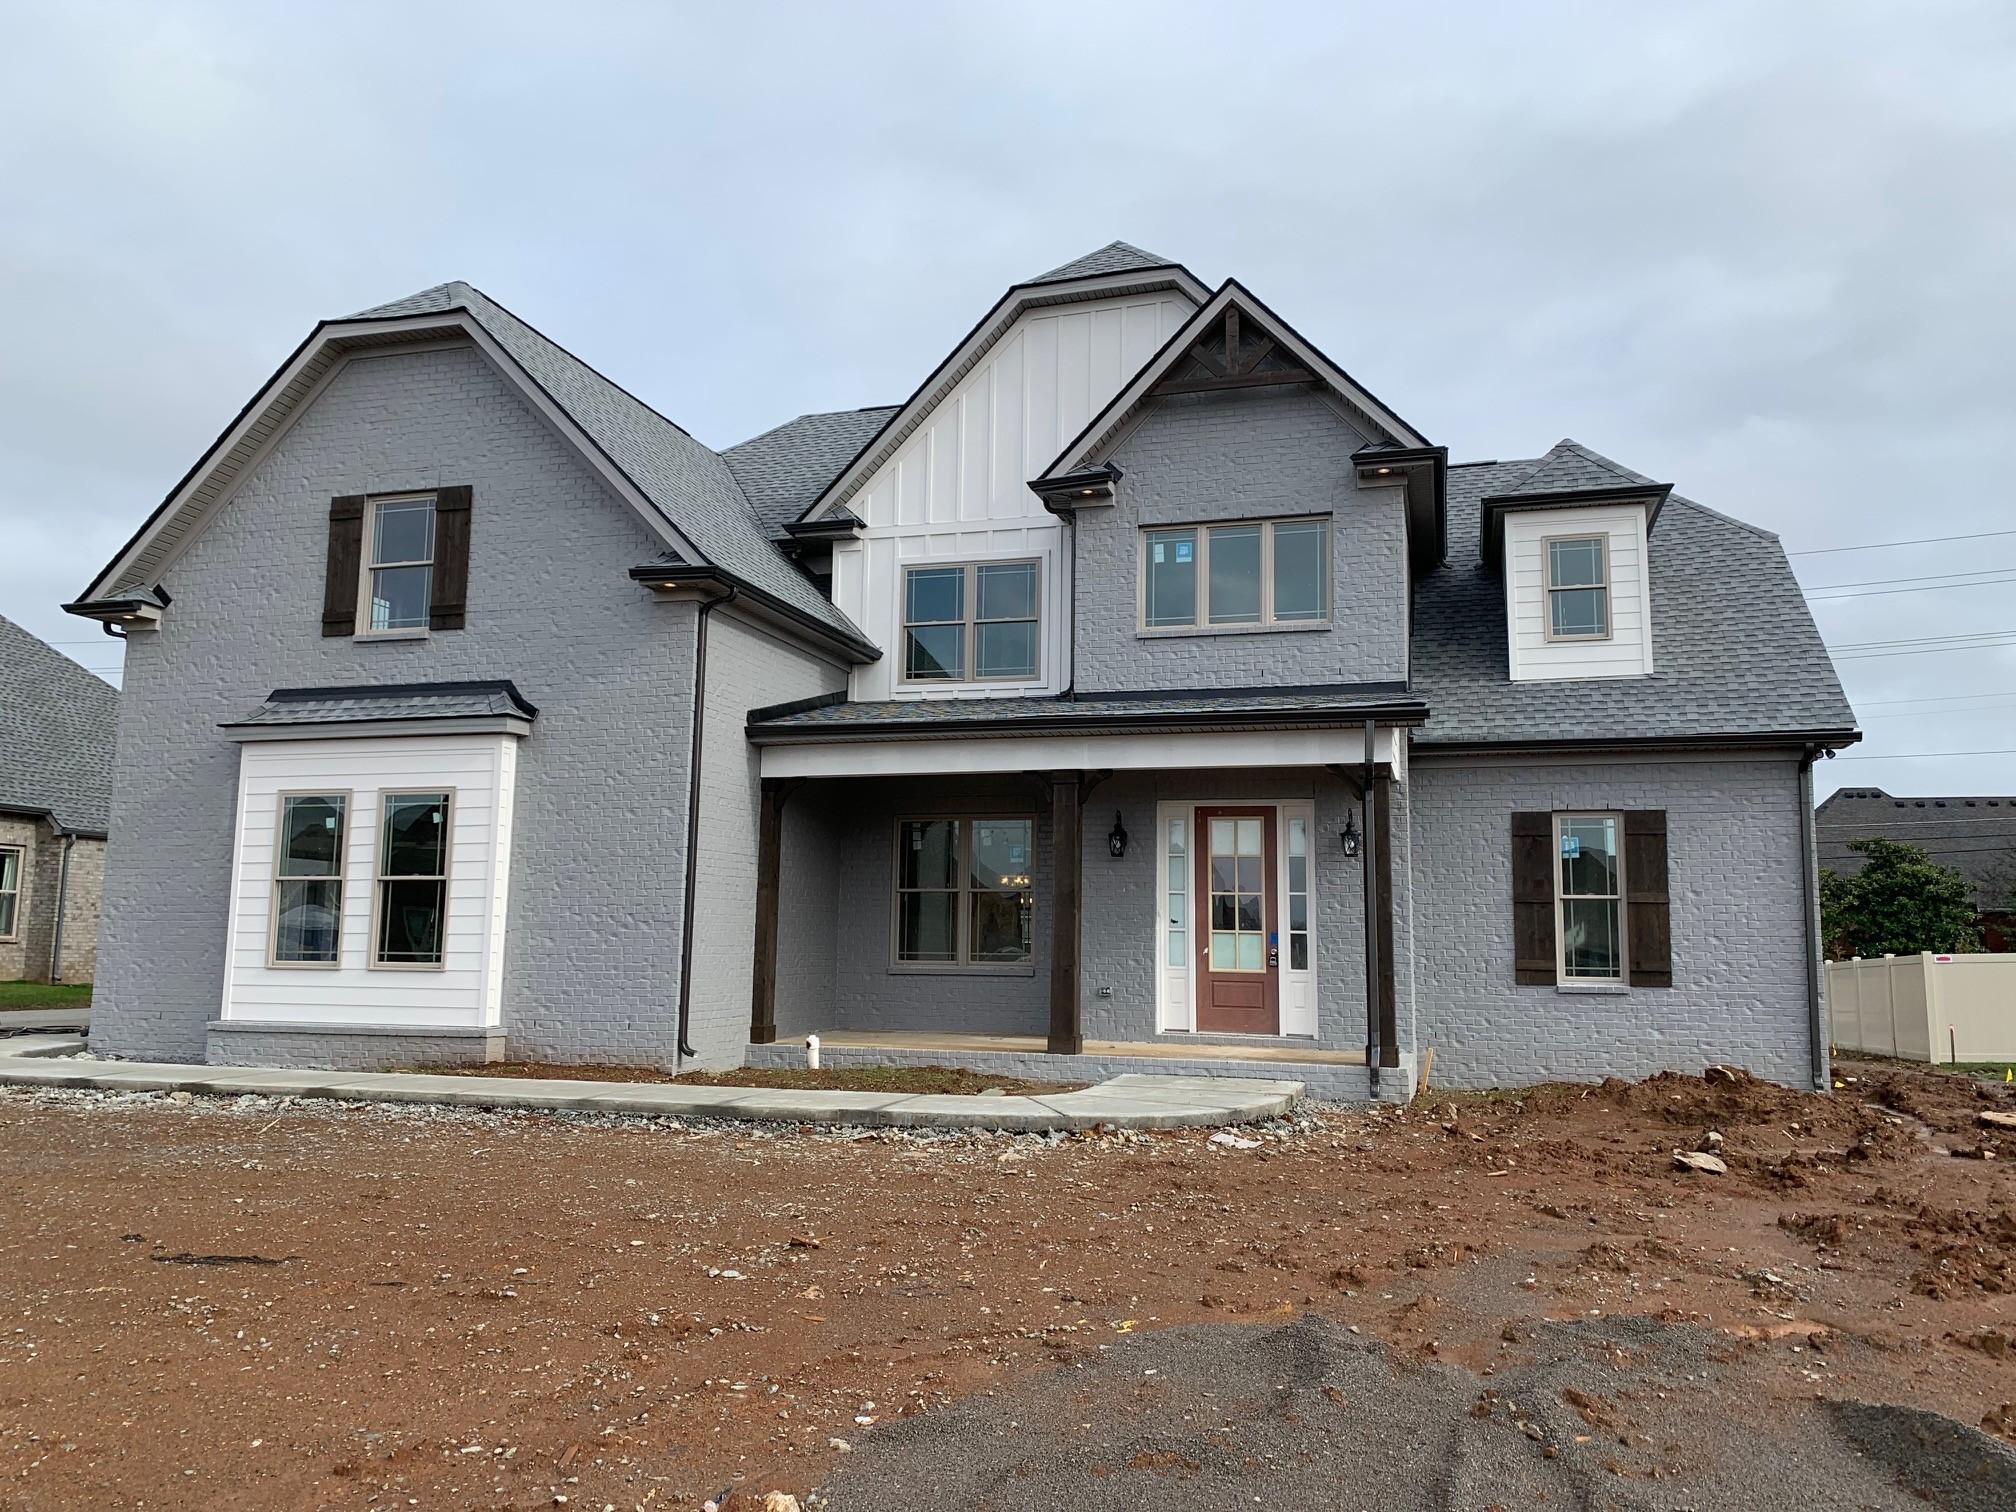 2818 Bertram Ct, Murfreesboro, TN 37129 - Murfreesboro, TN real estate listing